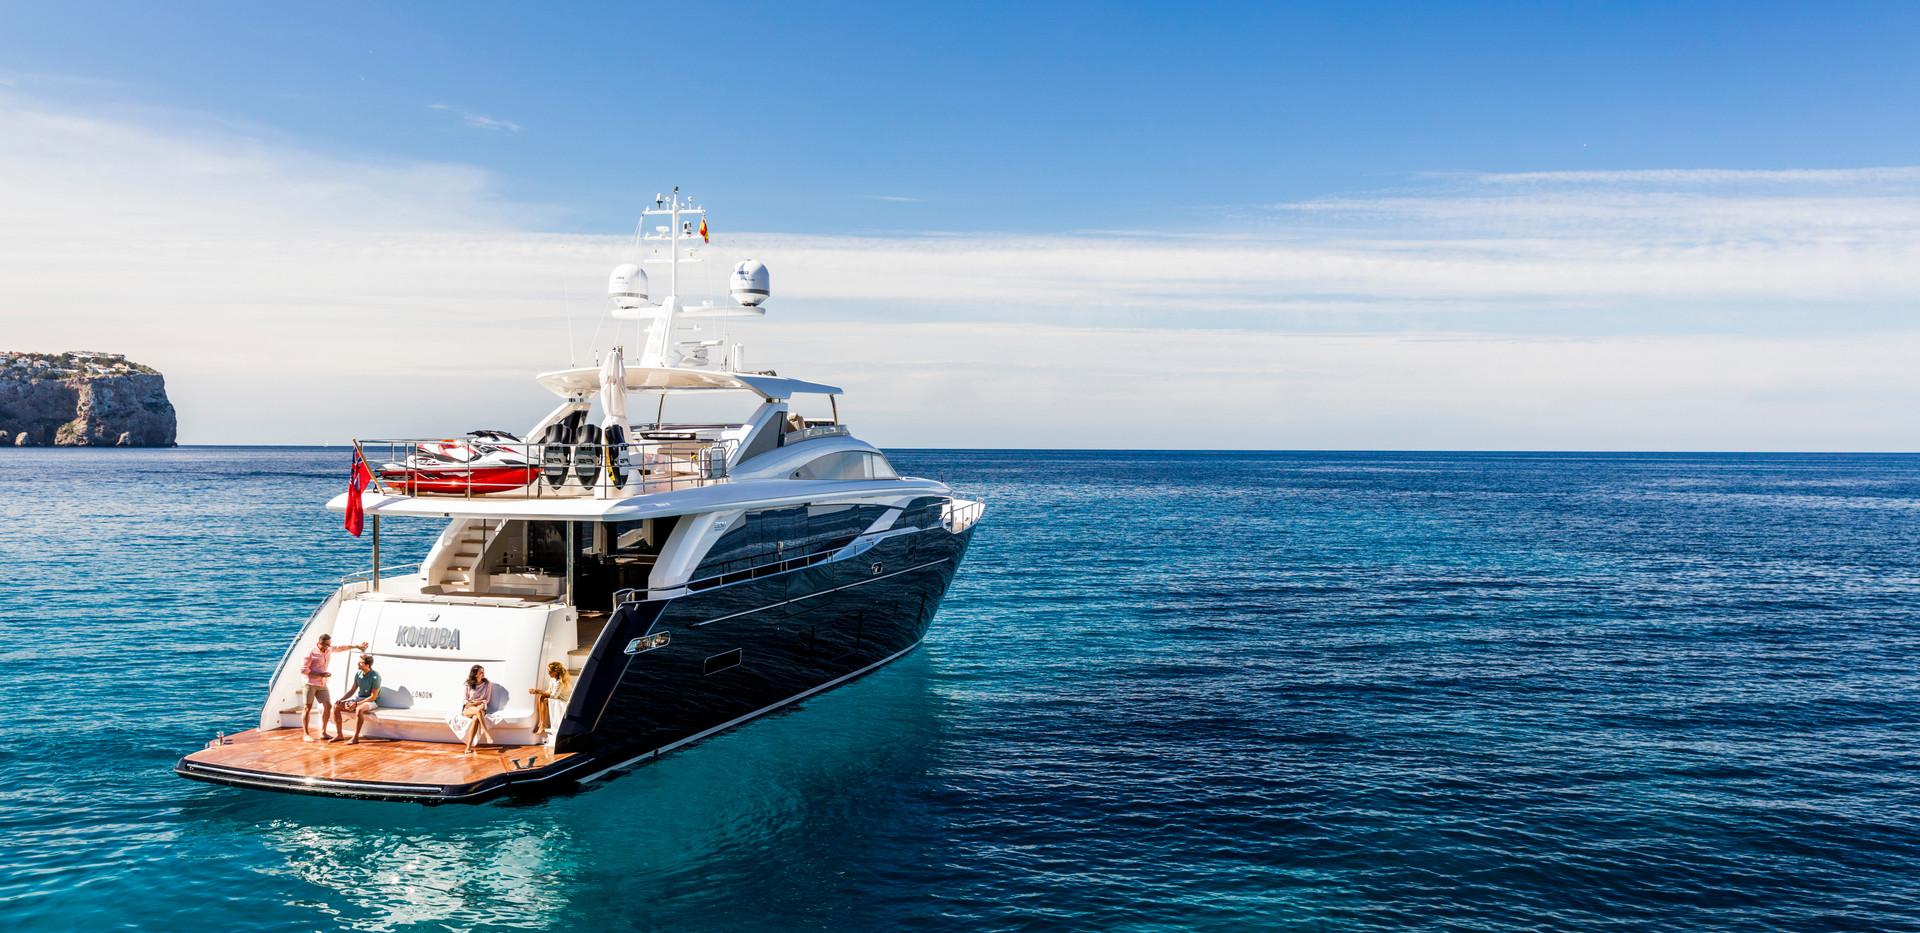 30m-exterior-blue-hull-22Yachrbrokers Pr